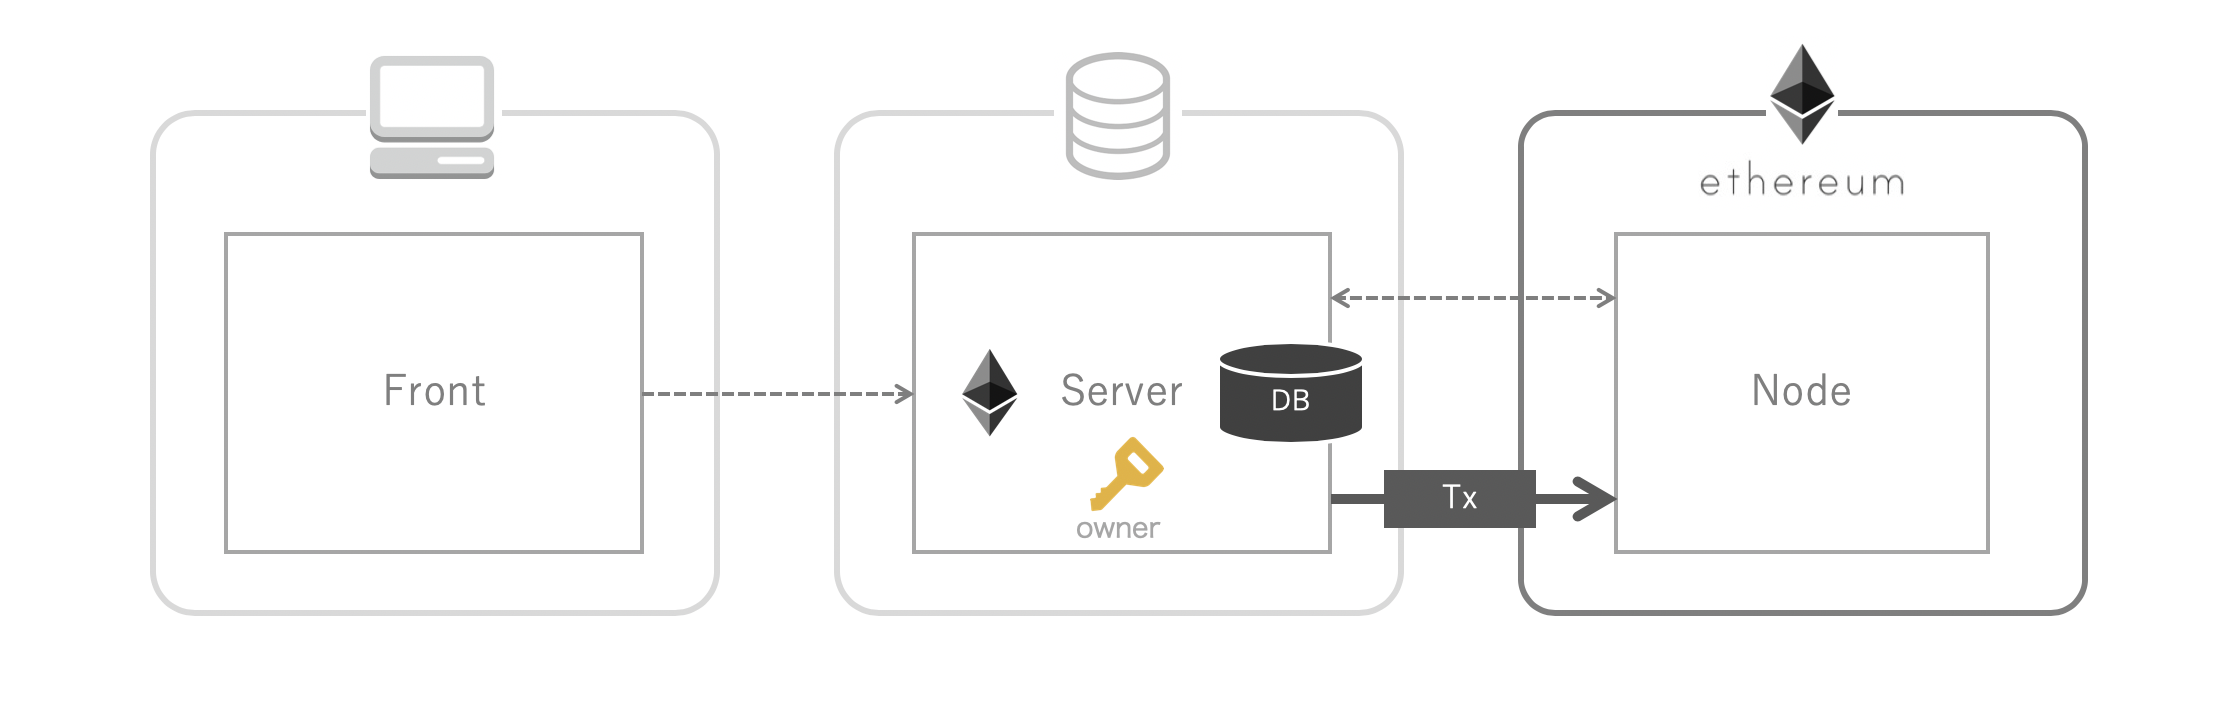 BlockchainTokyo23.png